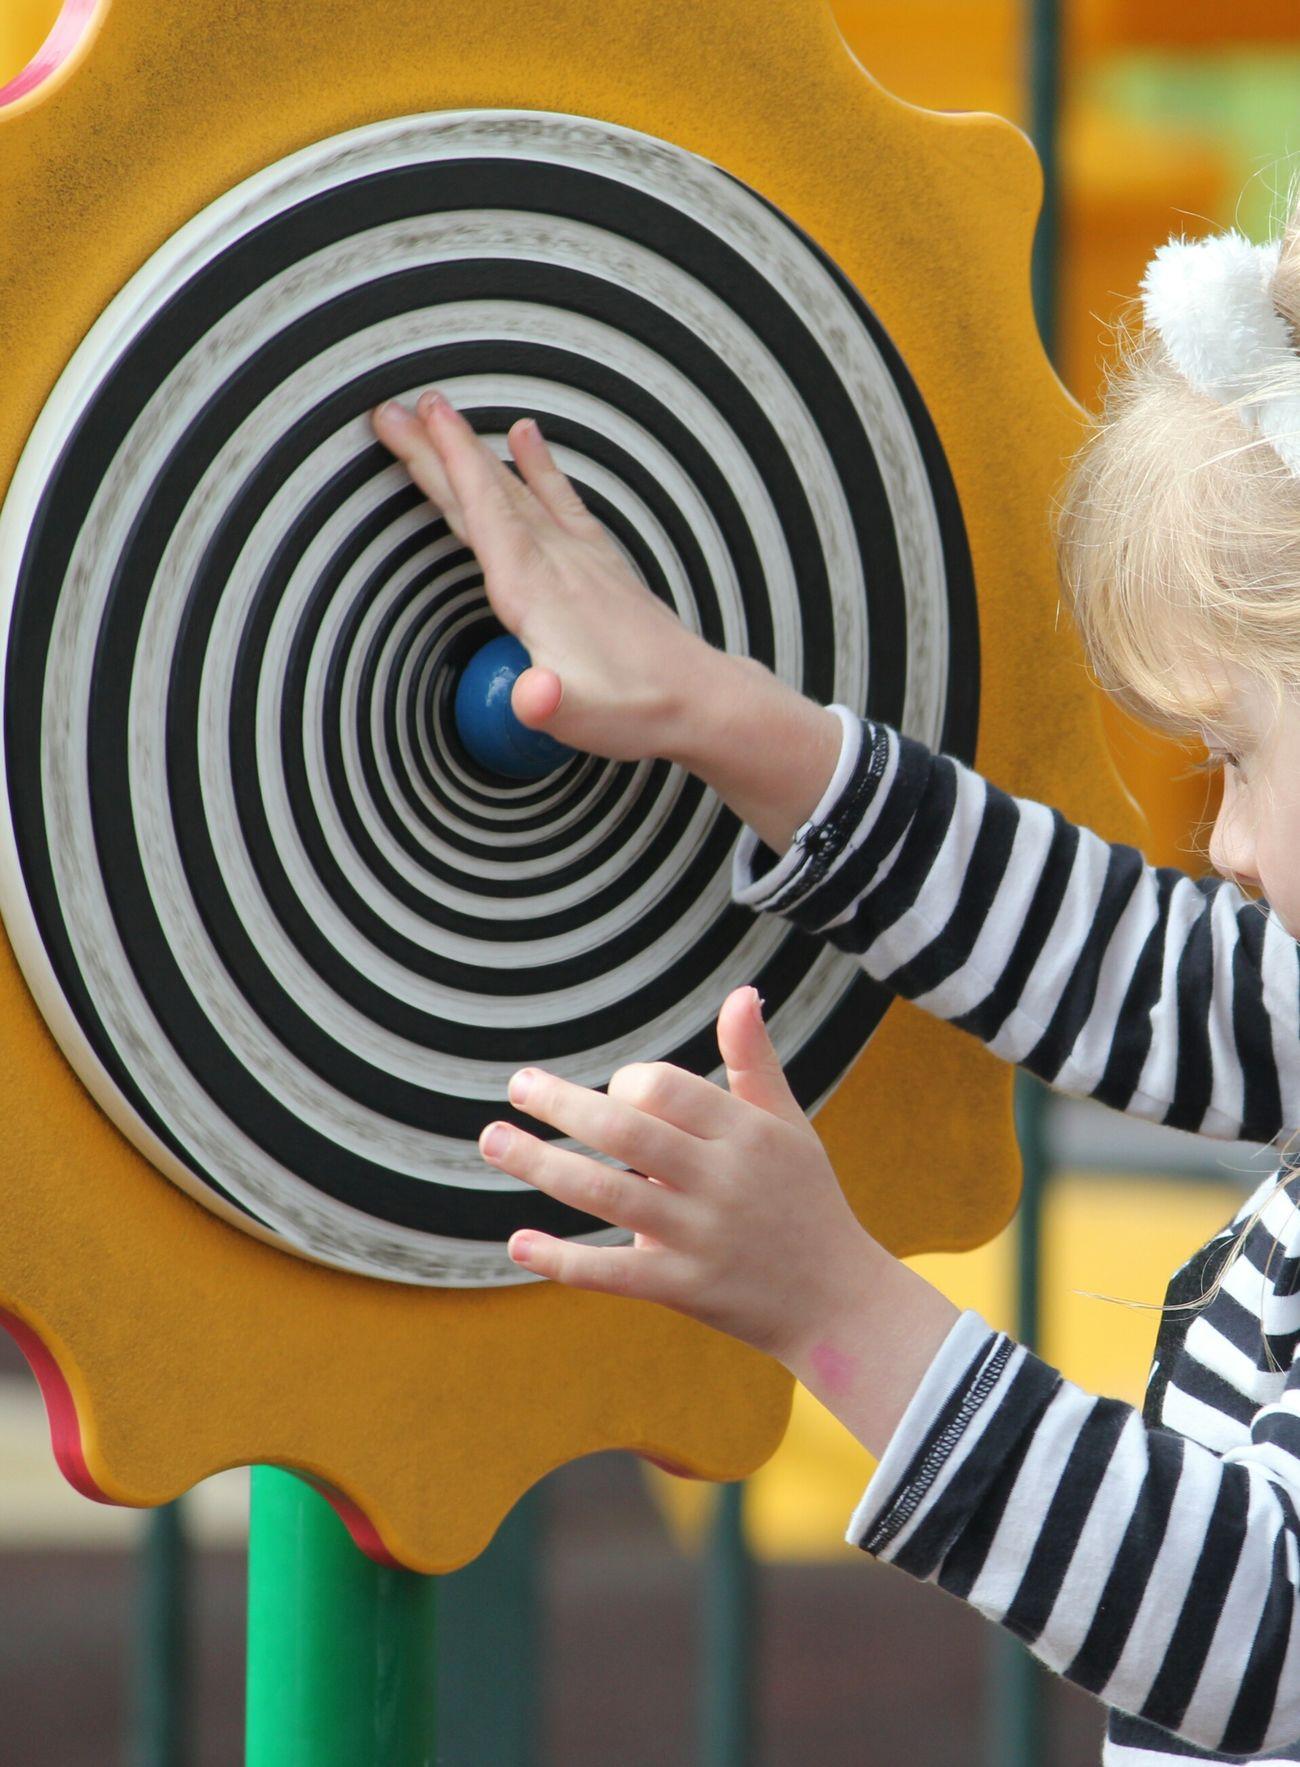 Stripes Everywhere Childs Play ❤️ Mesmerized